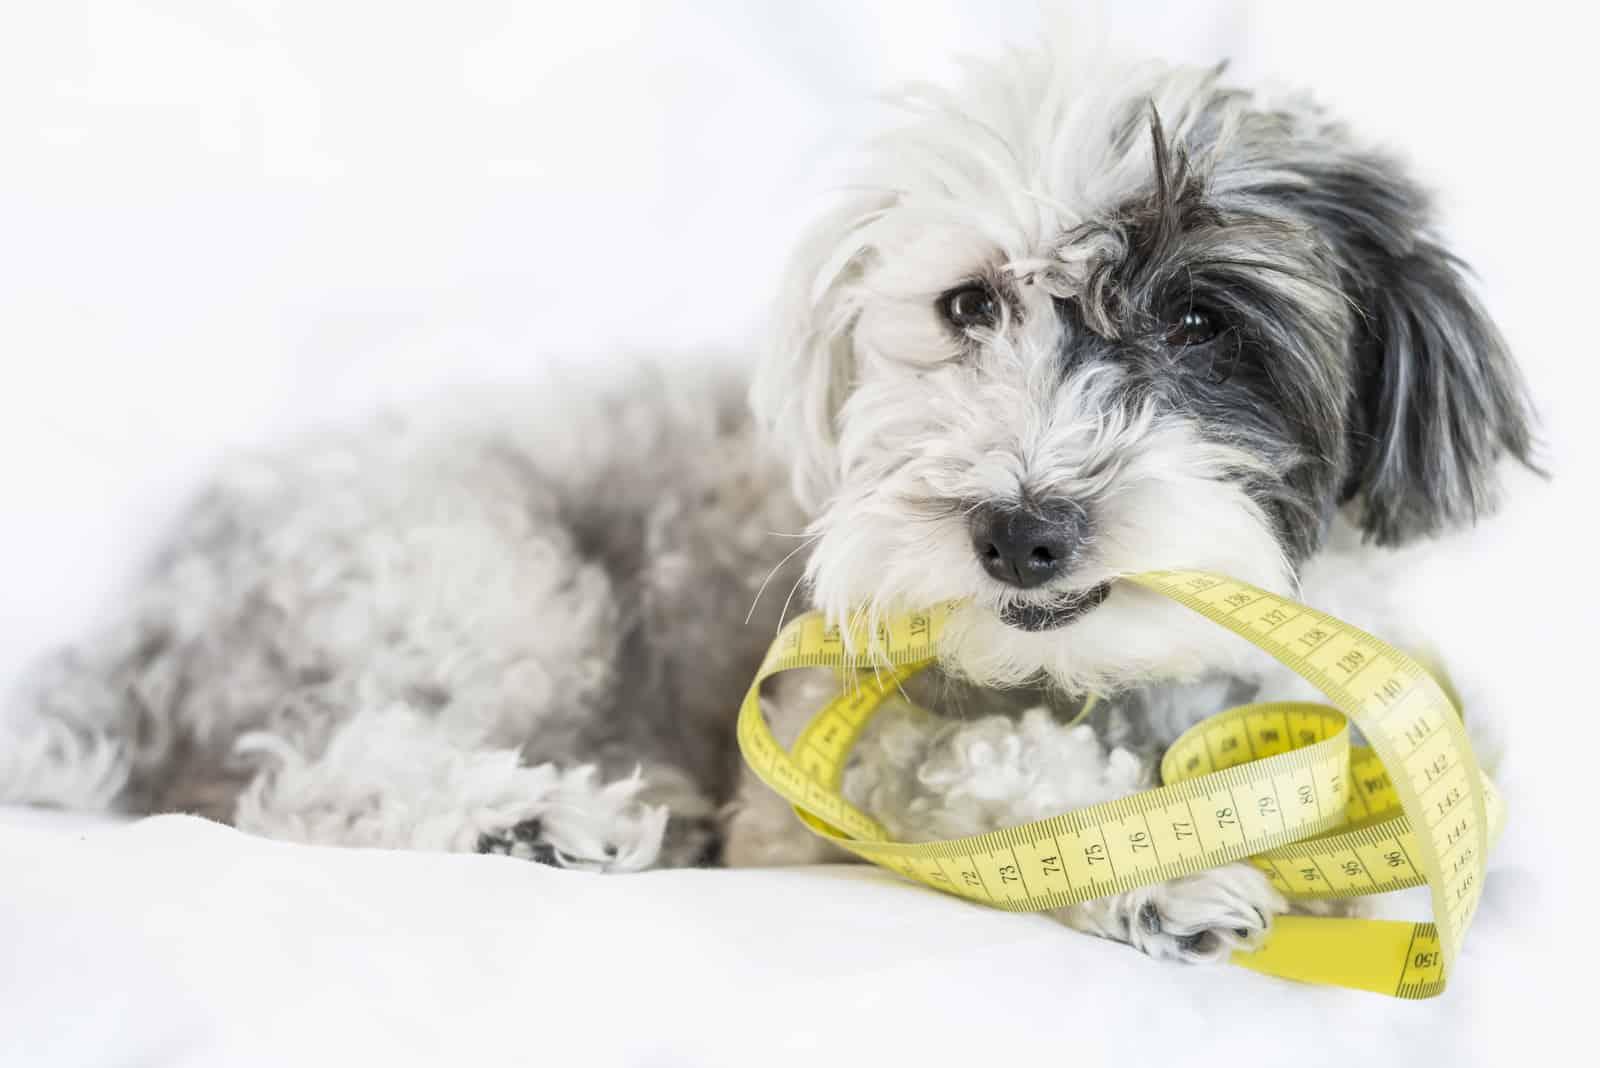 gesunder hungriger Pudelhund beißt gelbes Maßband